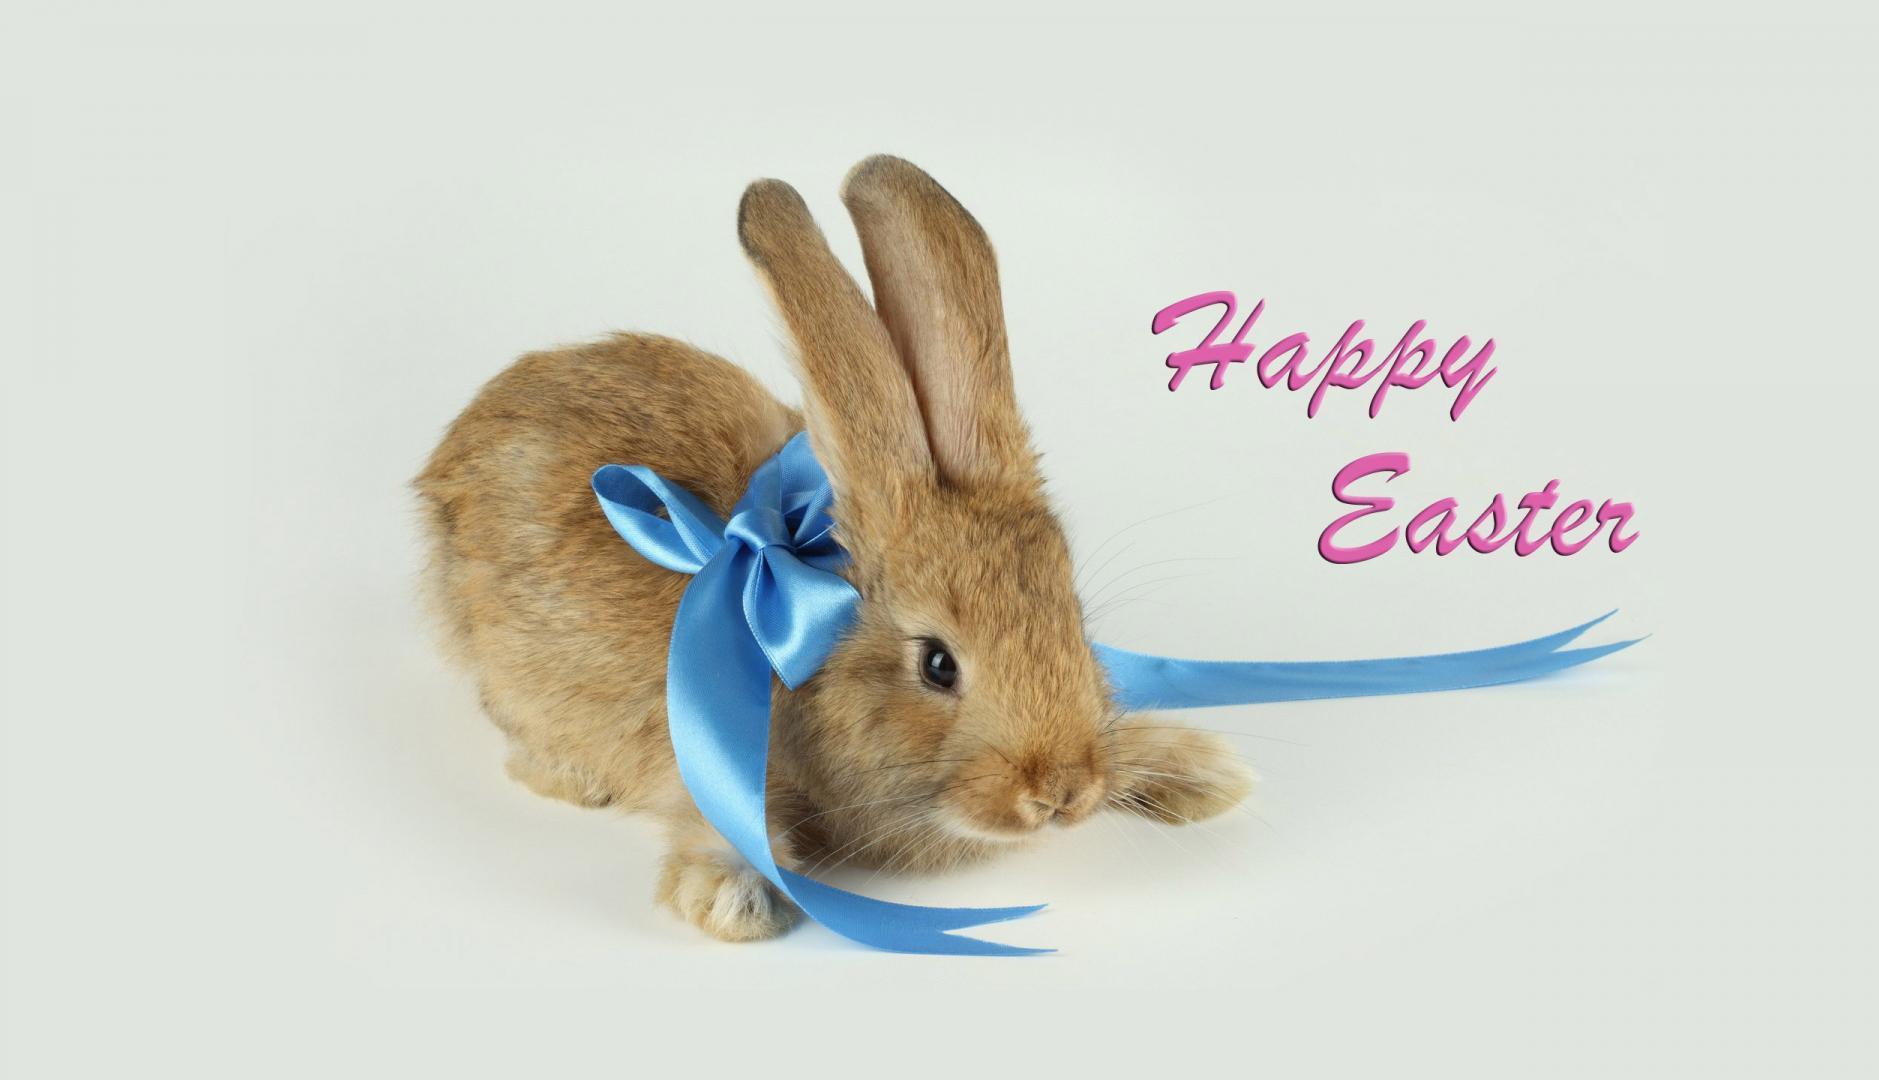 45 easter mobile wallpaper on wallpapersafari - Easter bunny wallpaper ...